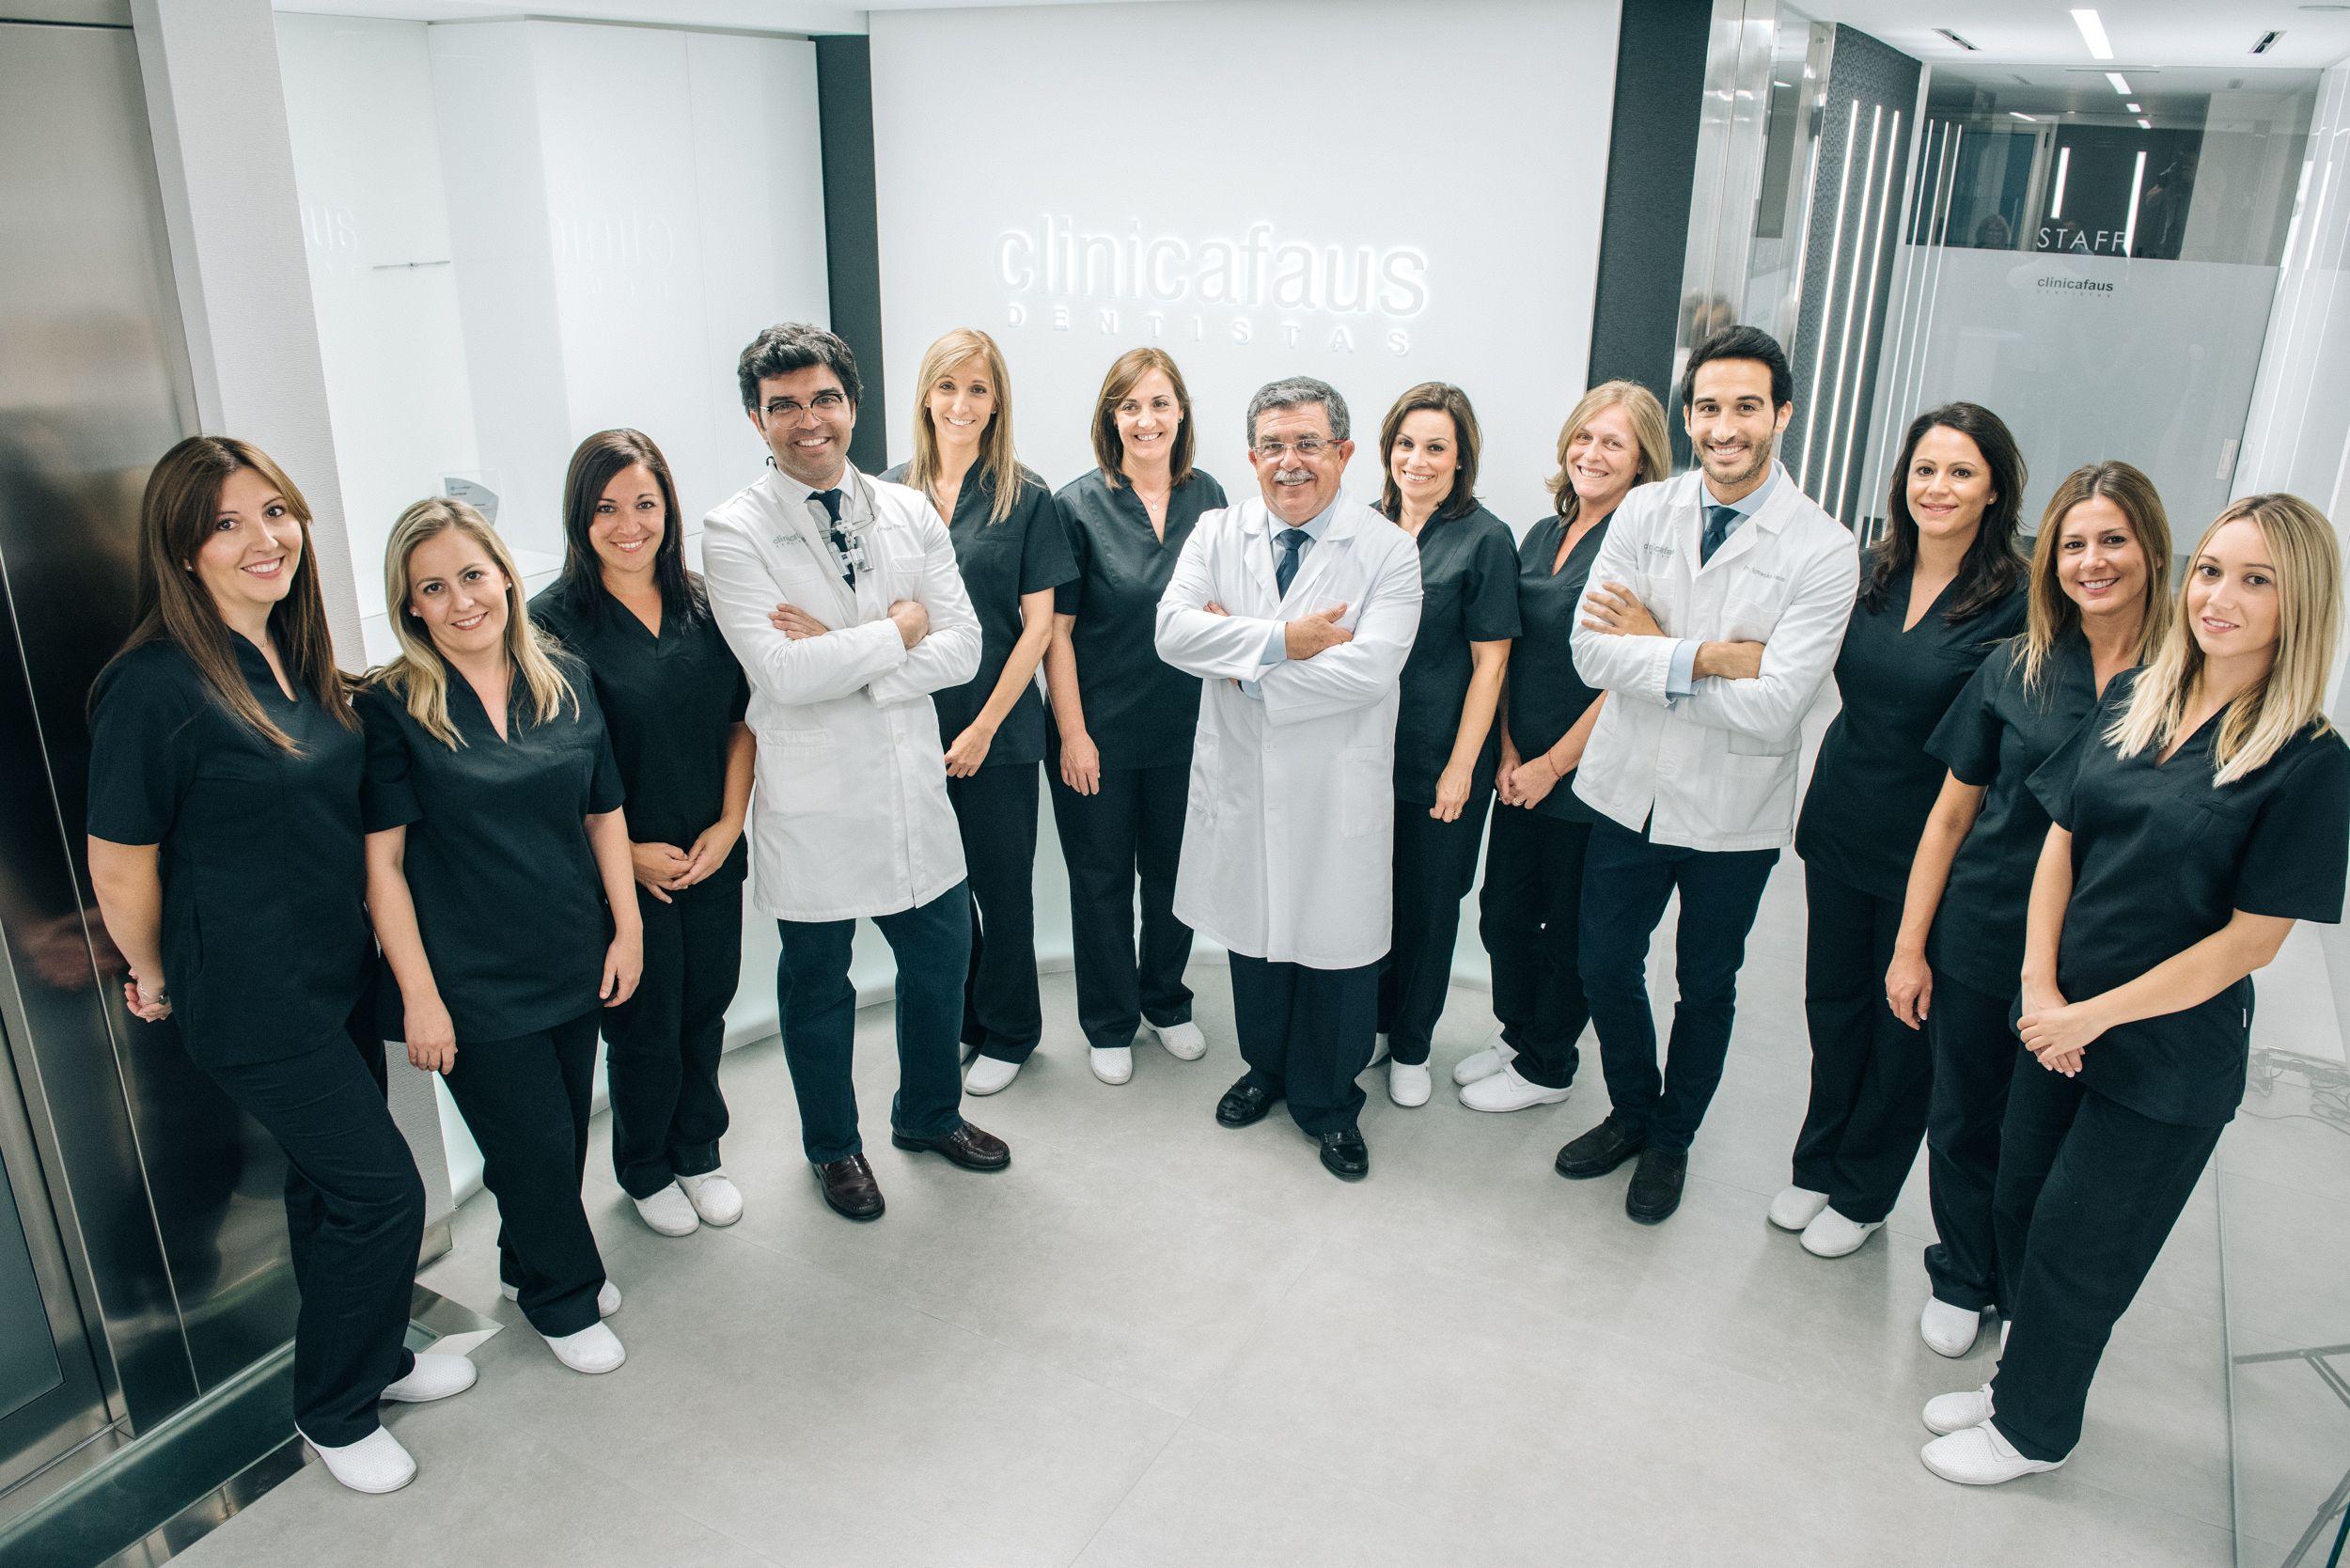 Faus Dental Clinic